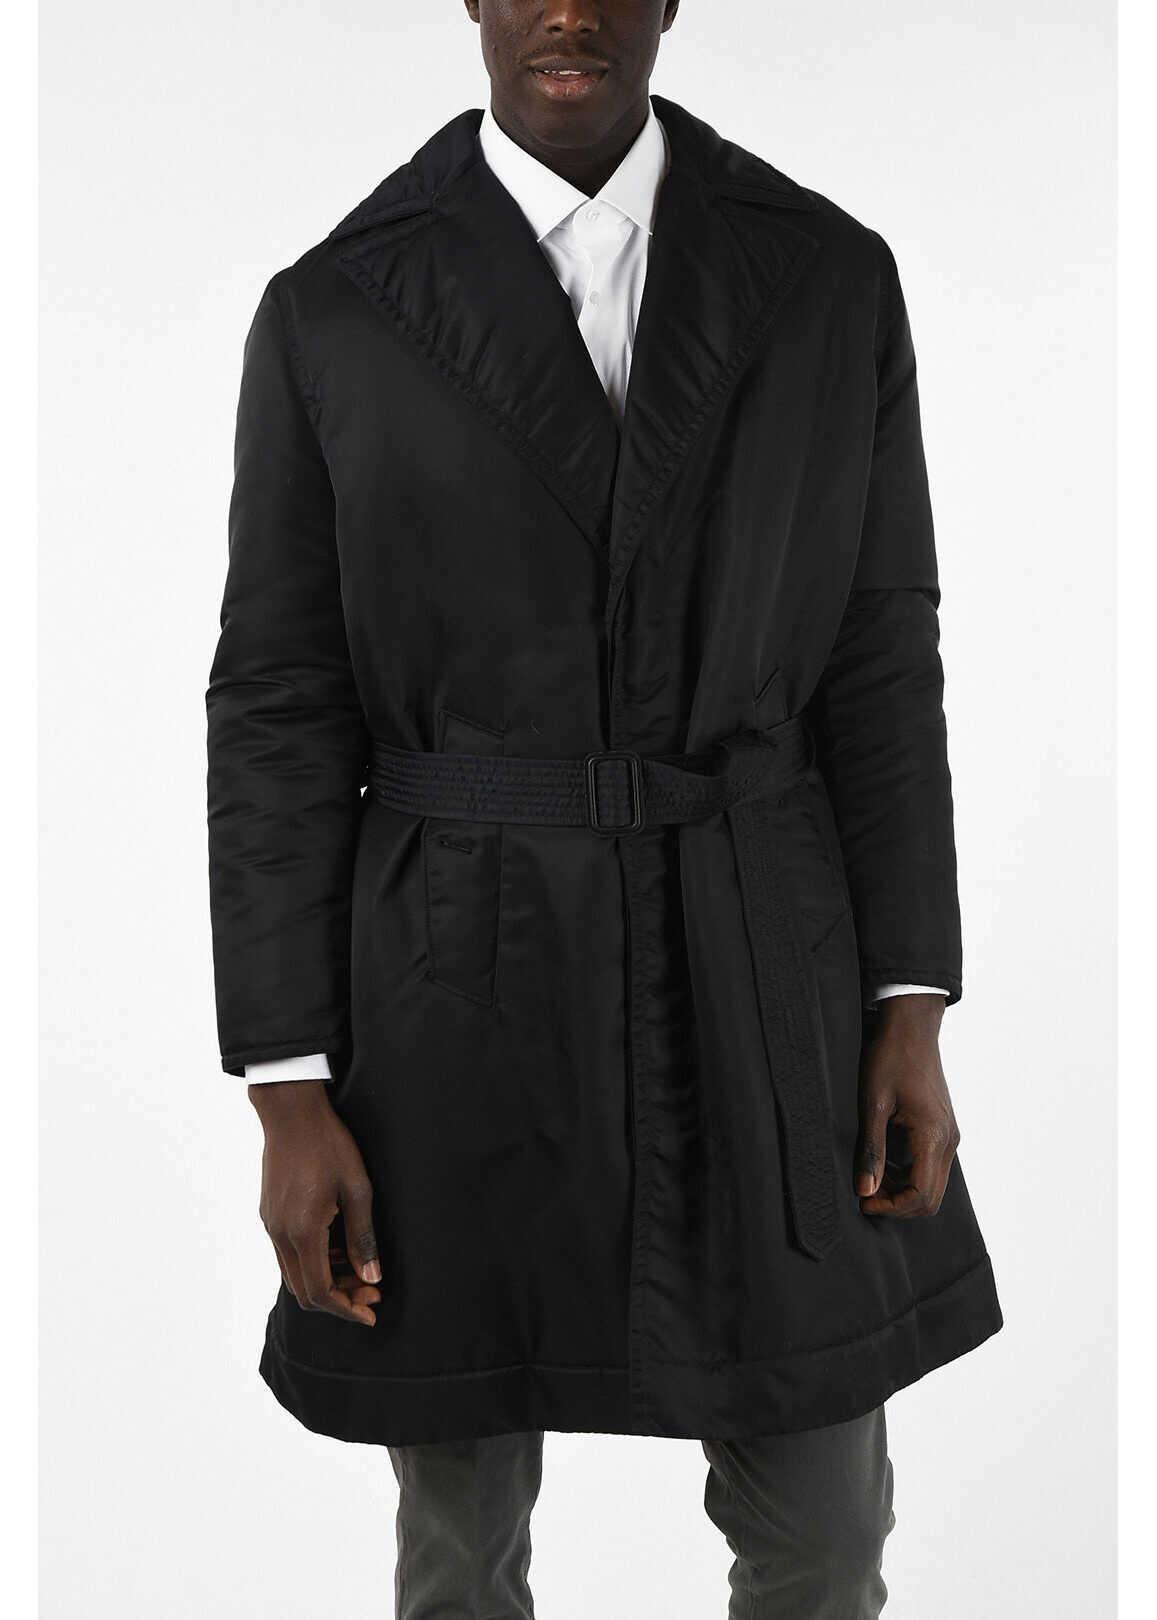 Calvin Klein 205W39NYC Shell Coat with belt BLACK imagine